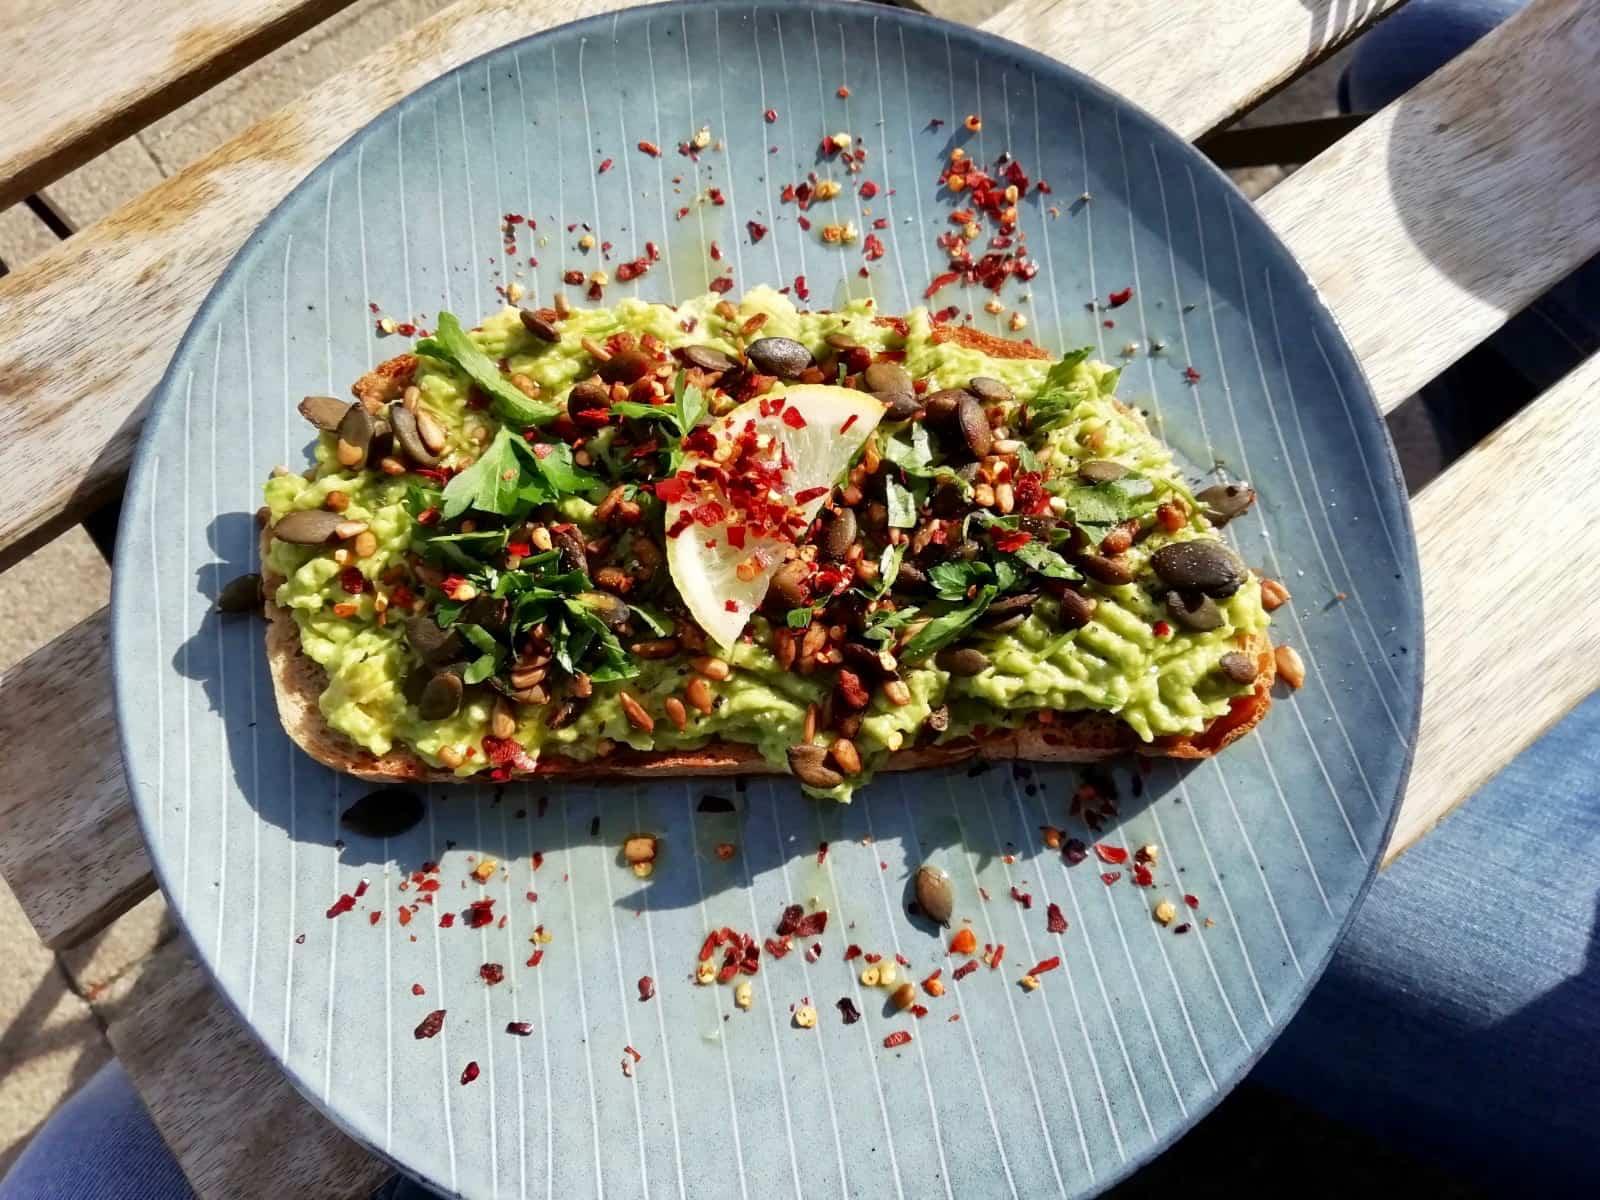 Avocado toast from The Longhouse Cafe, Brighton